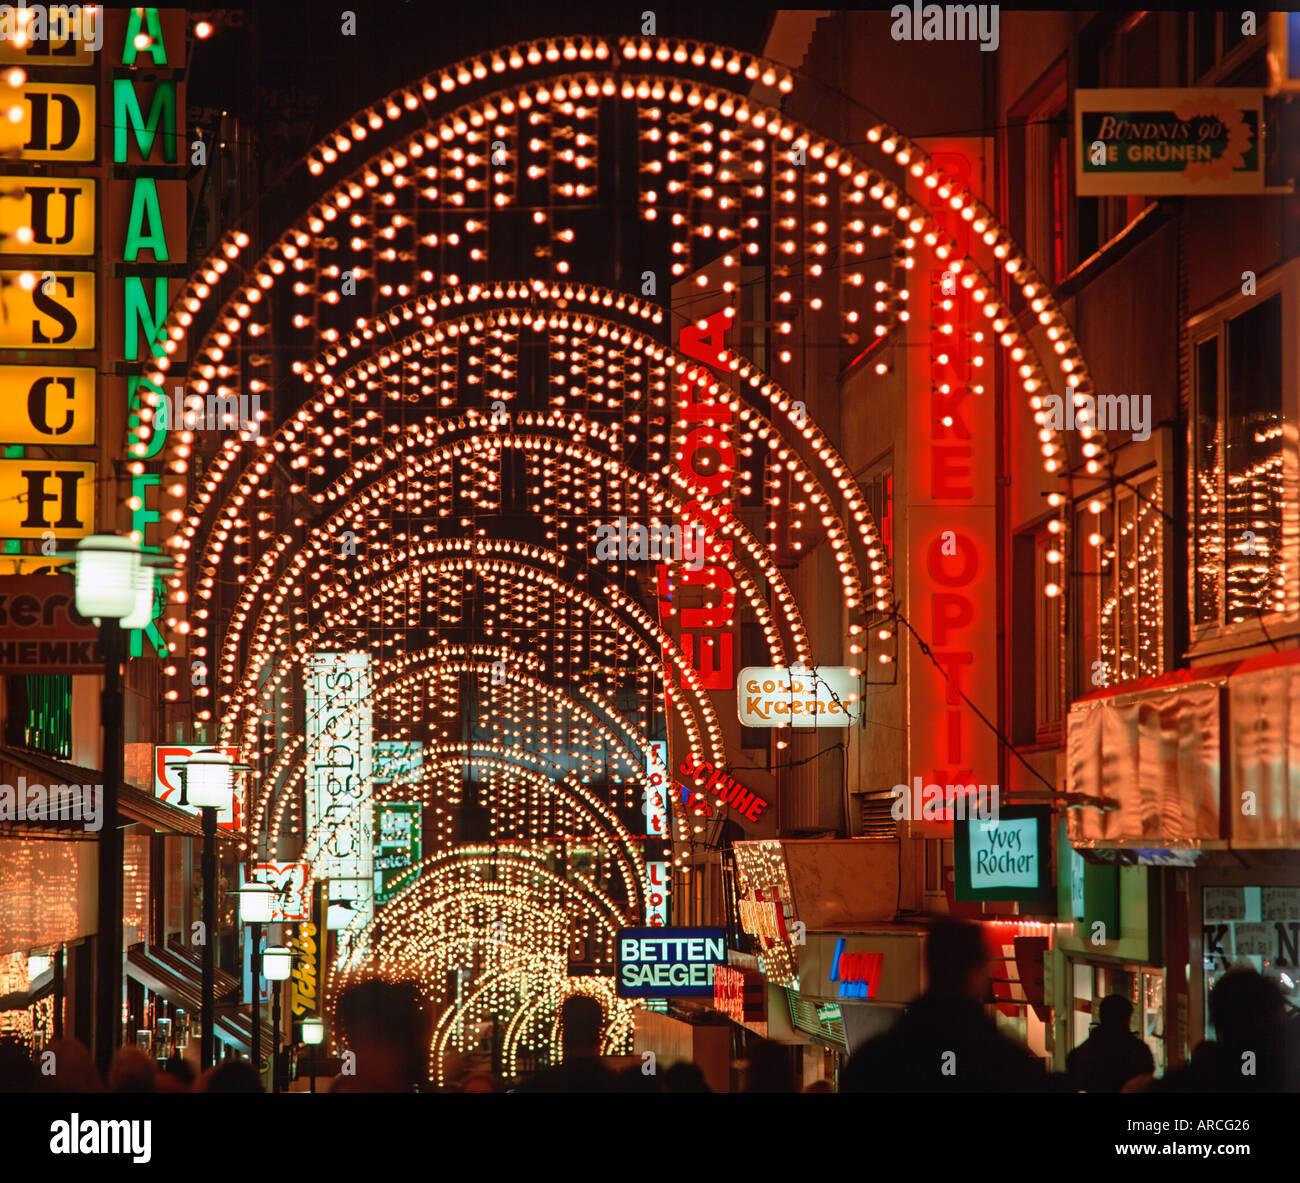 Essen Light Weeks Stock Photo